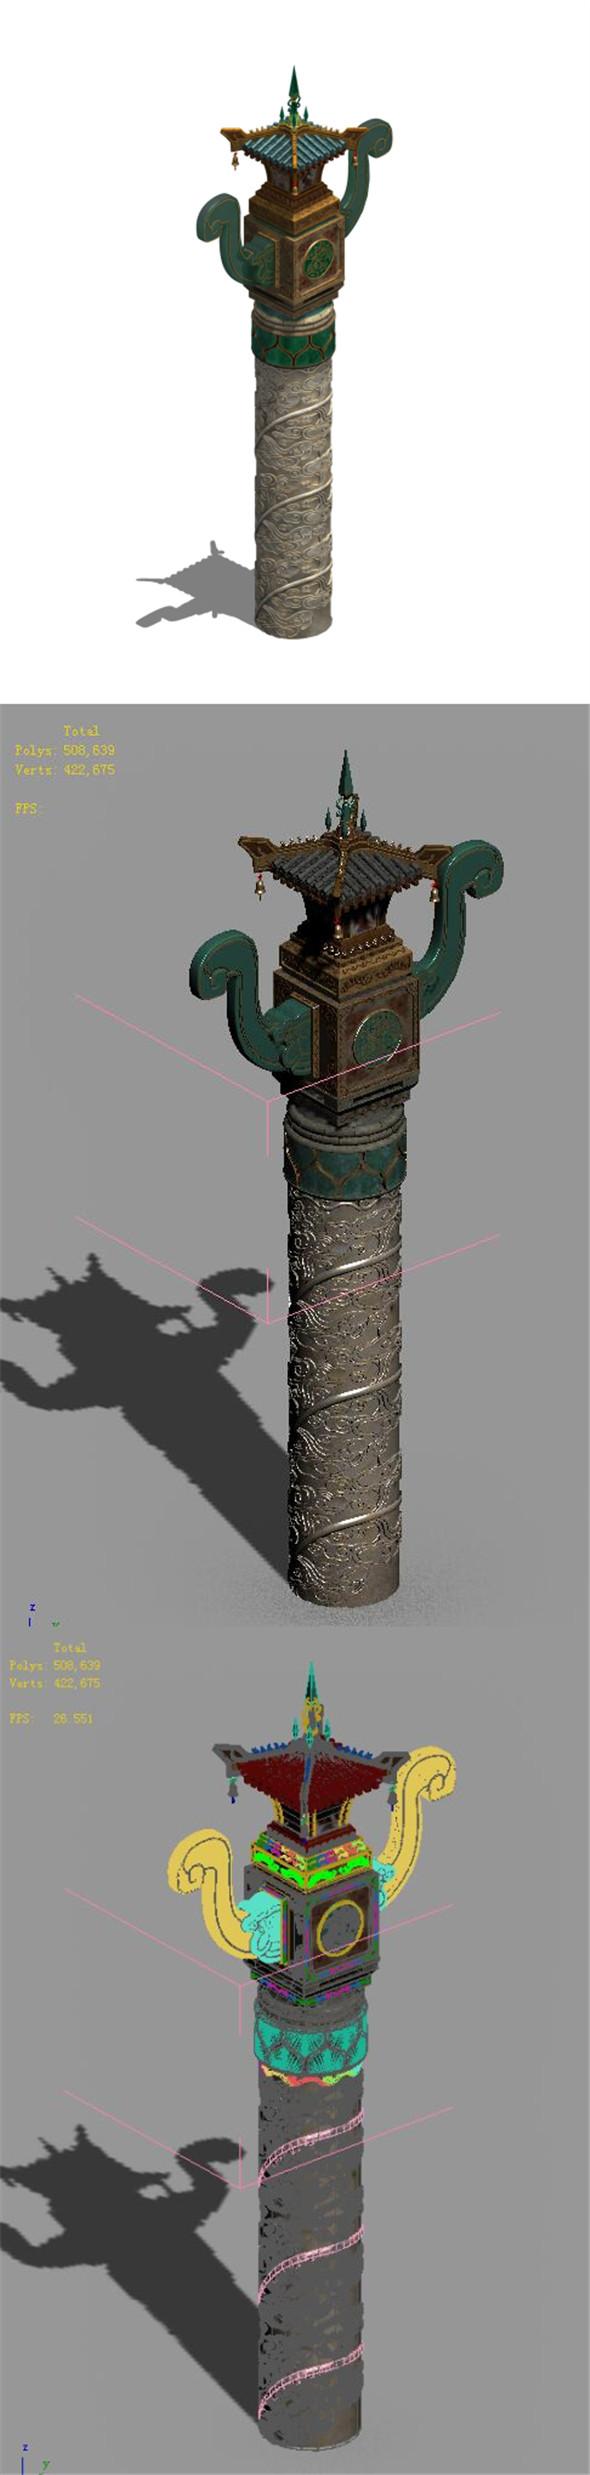 Decoration - pillar 23 - 3DOcean Item for Sale